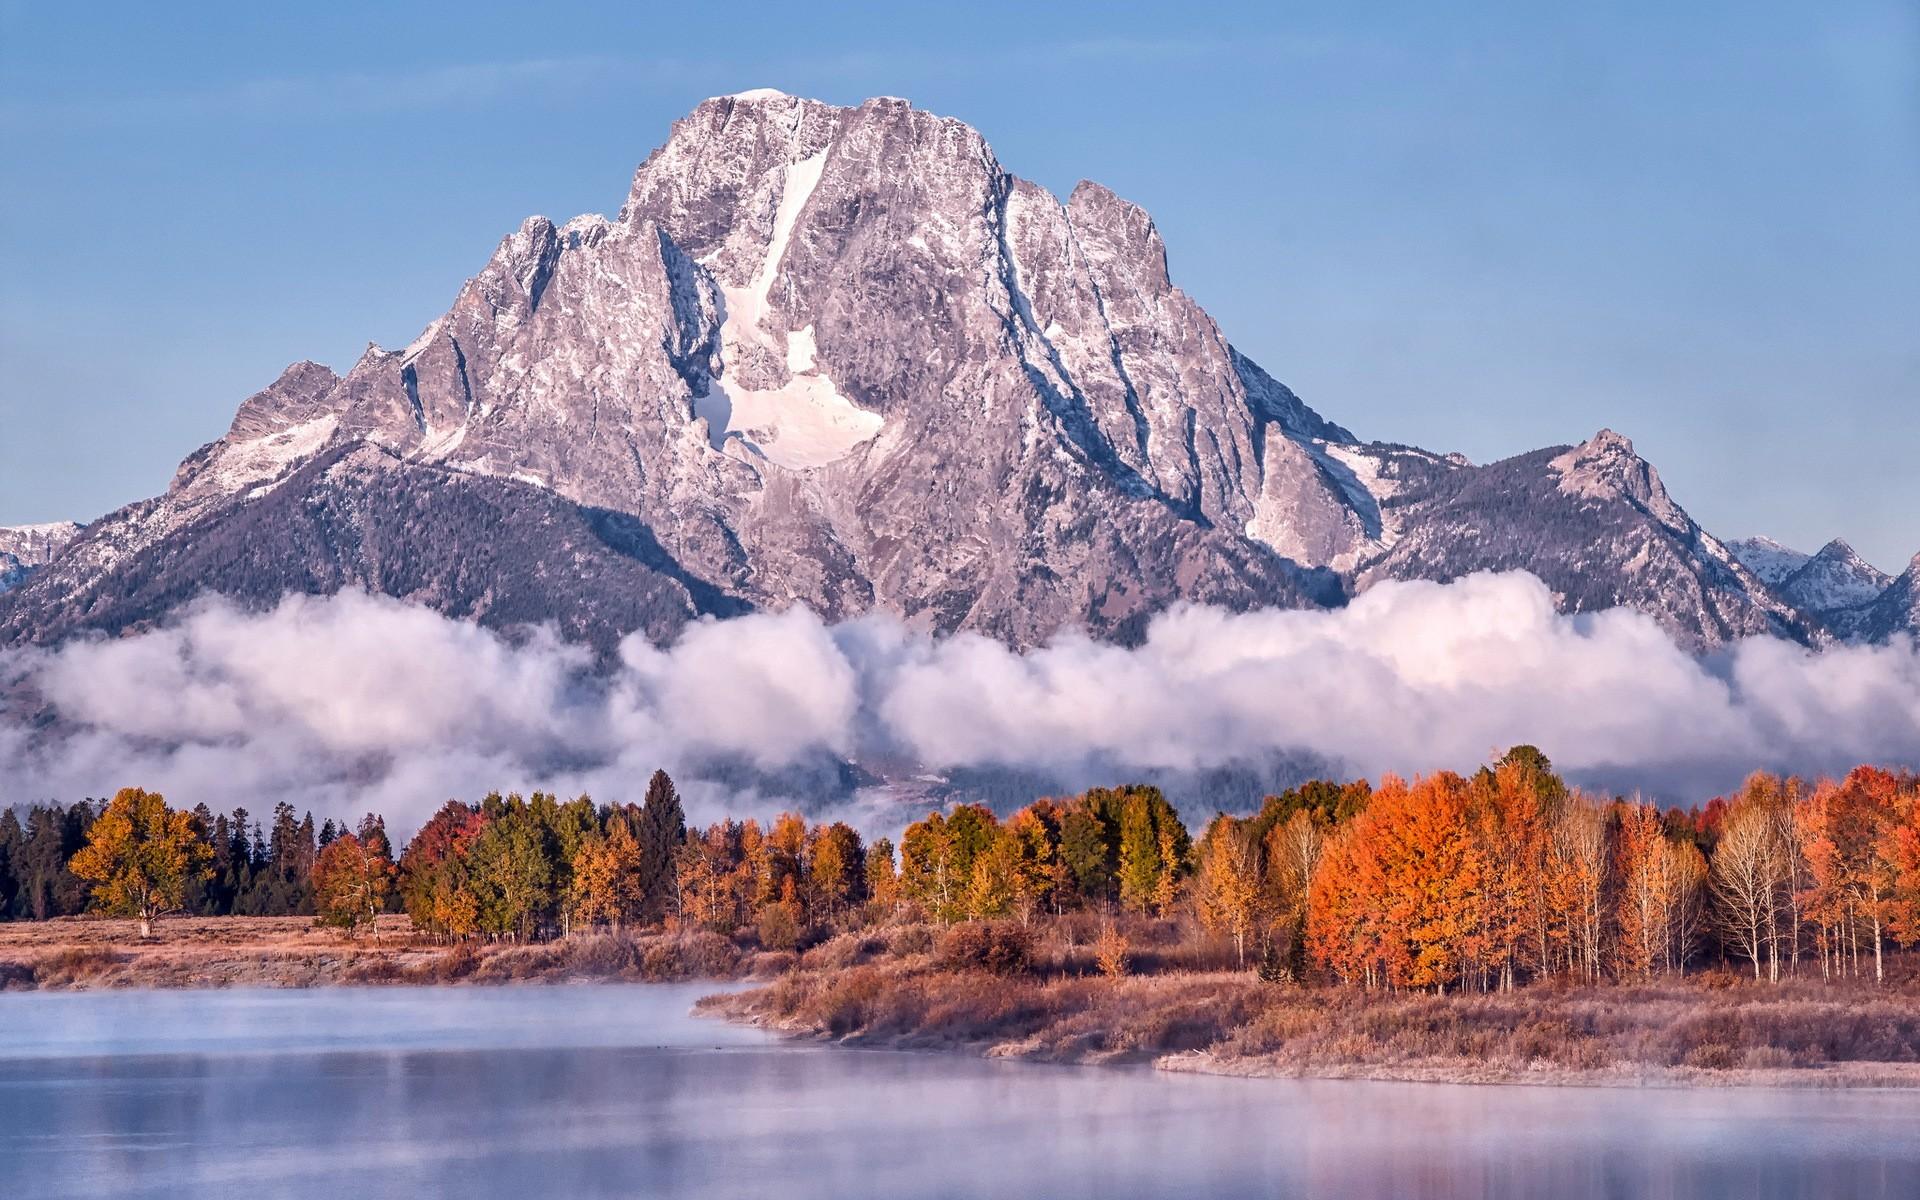 Free Download Hd Montagne Automne Lac Feuille Arbre Rouge